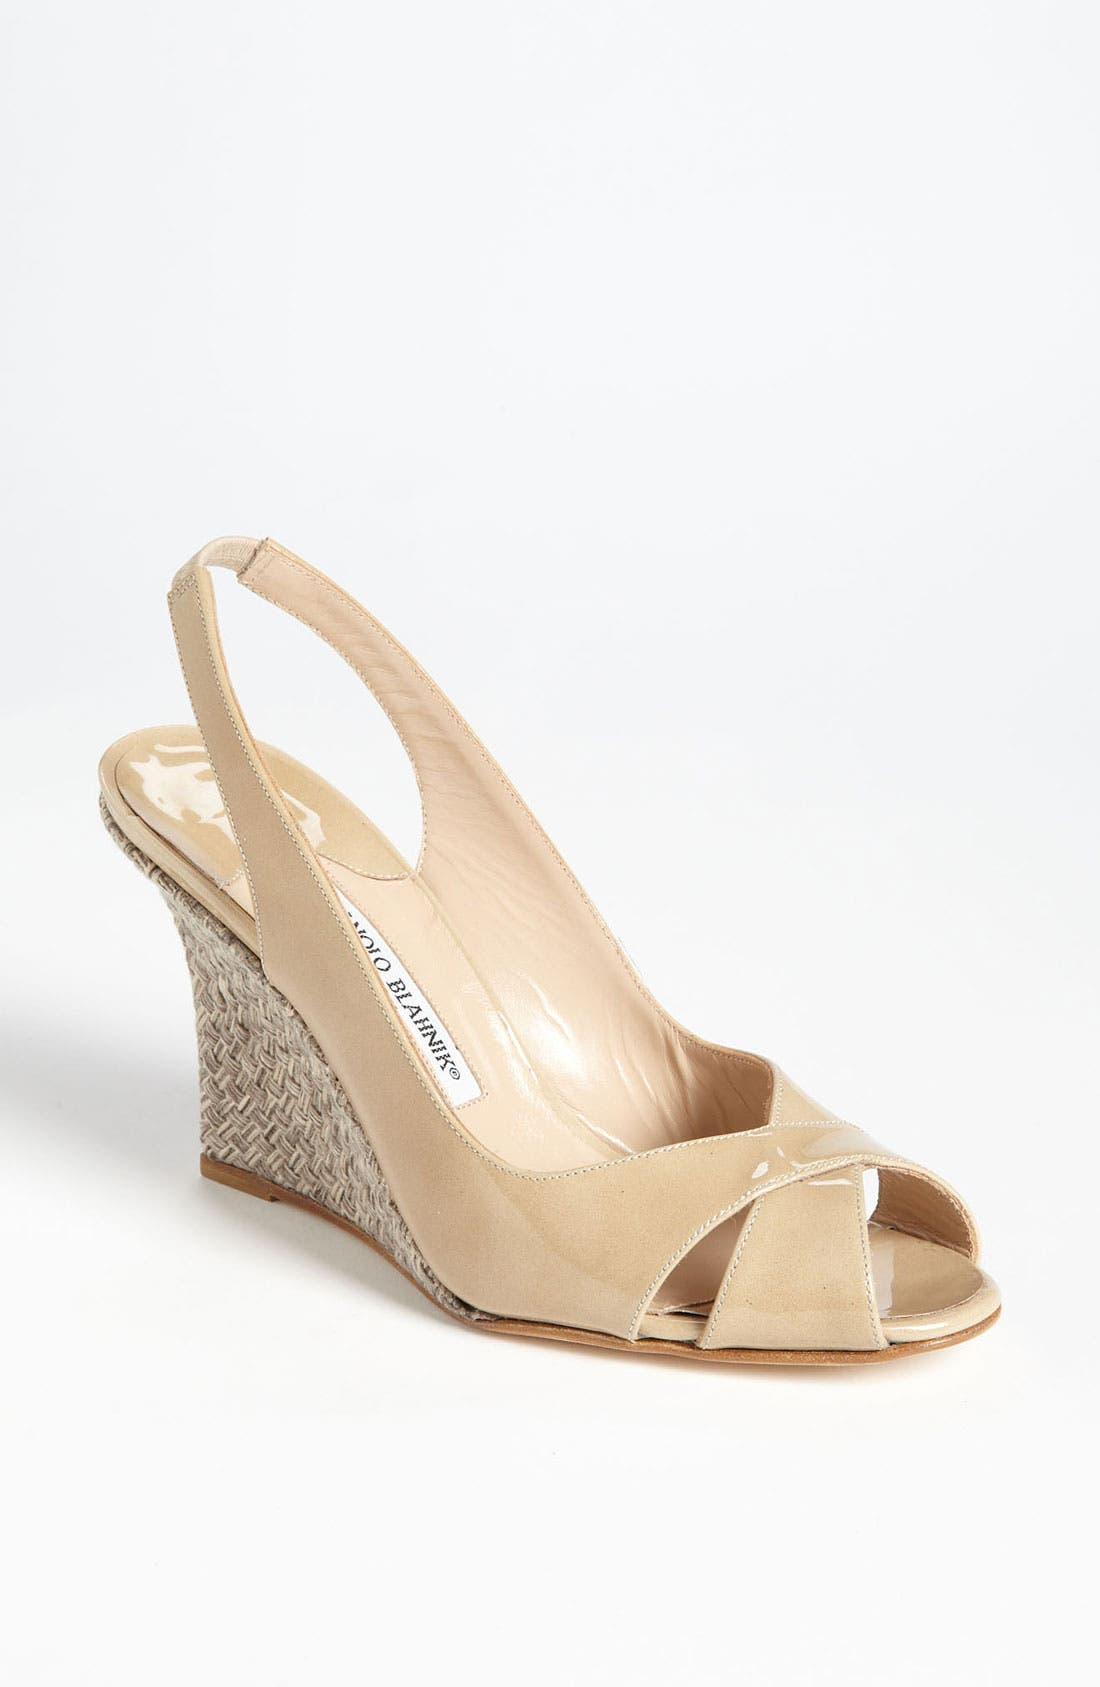 Alternate Image 1 Selected - Manolo Blahnik 'Shala' Wedge Sandal